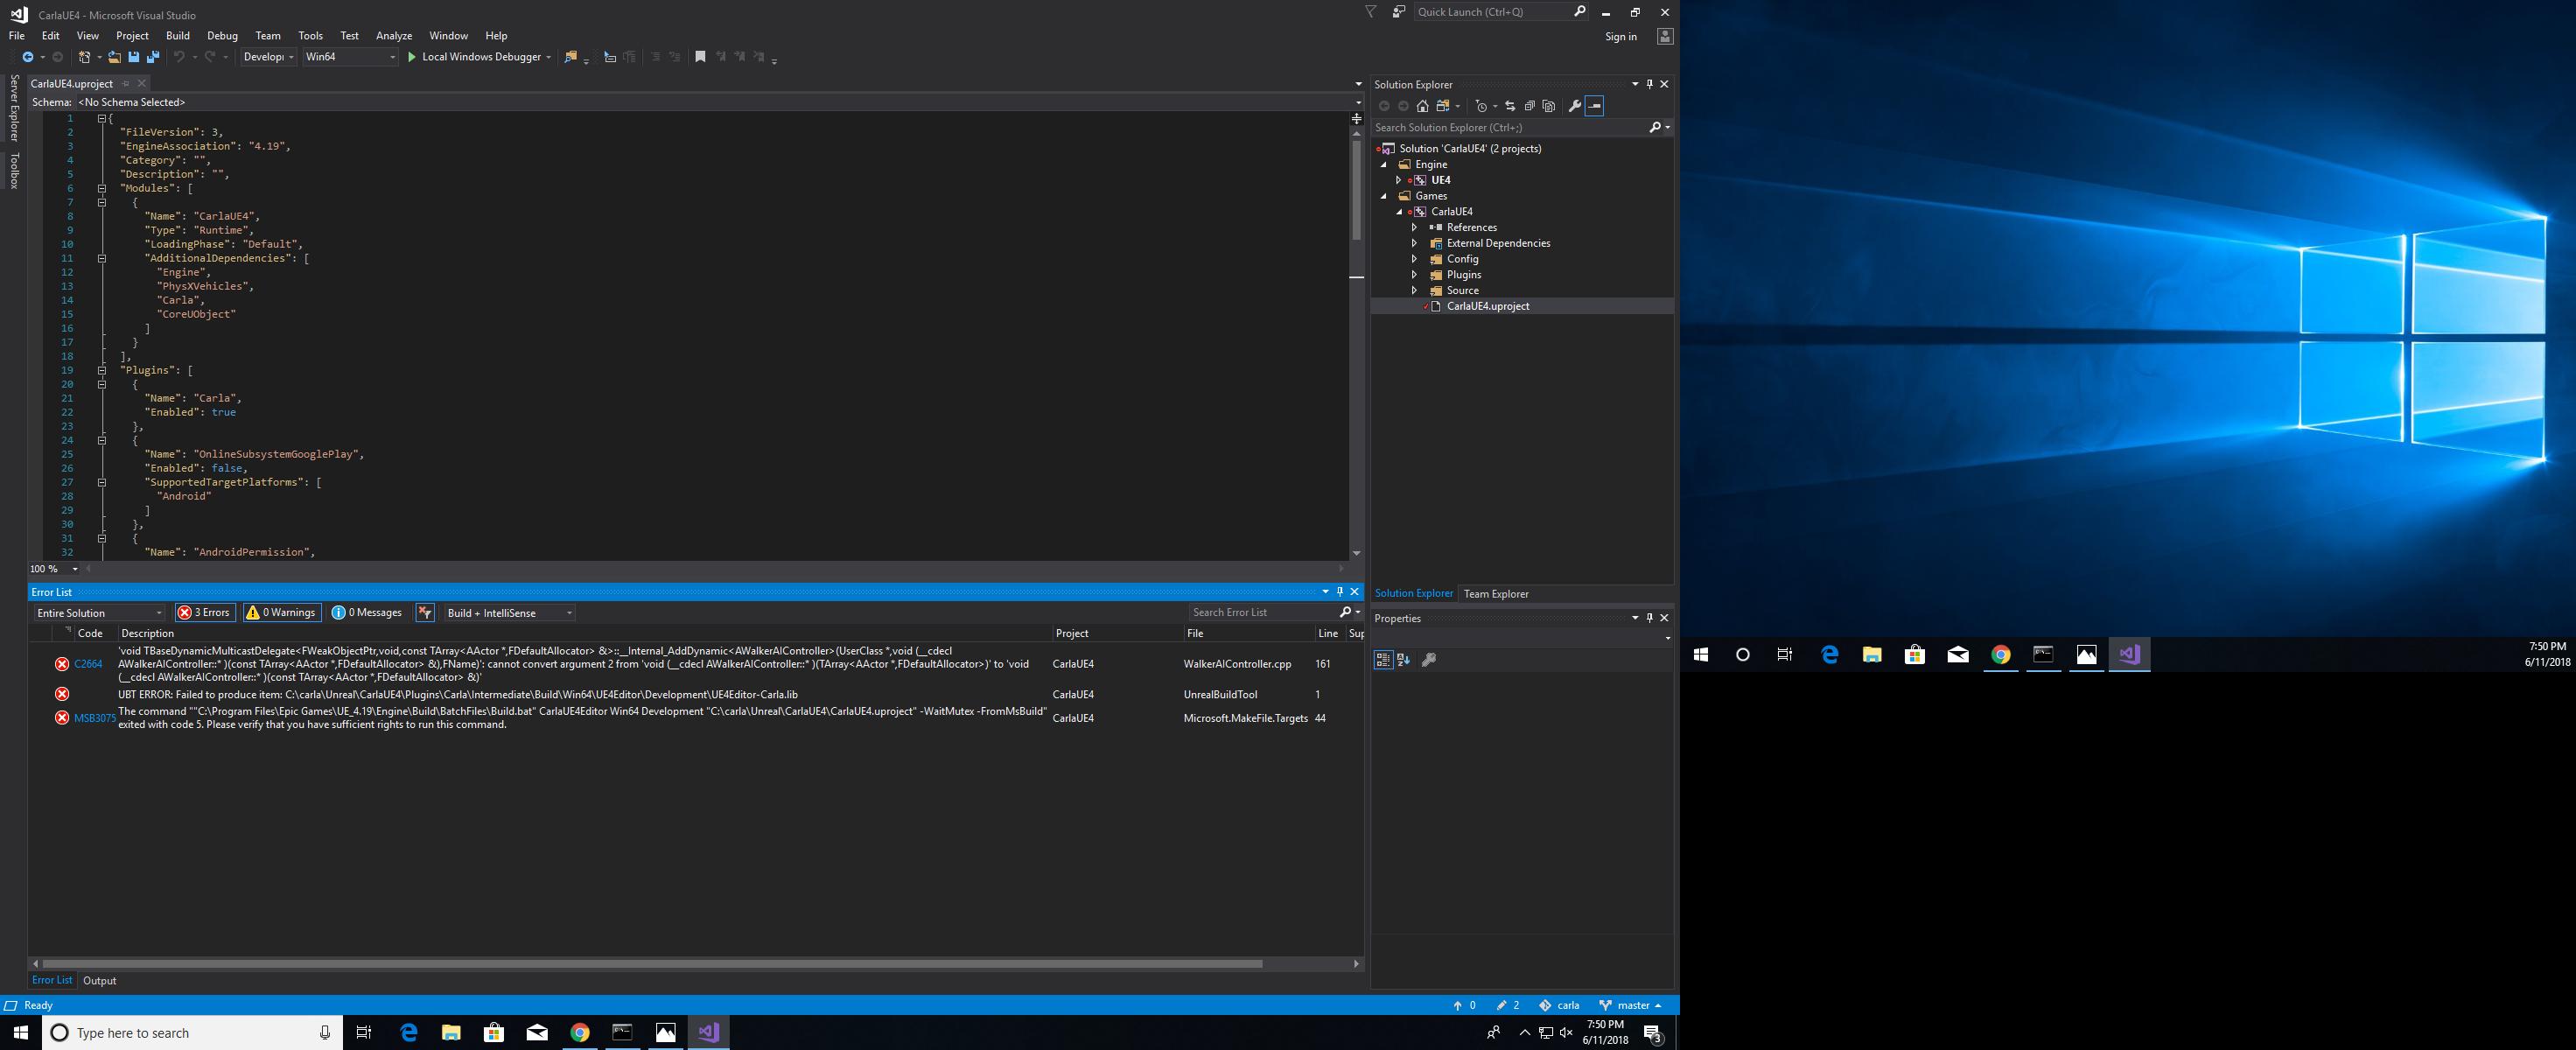 Building on Windows 0 8 X · Issue #21 · carla-simulator